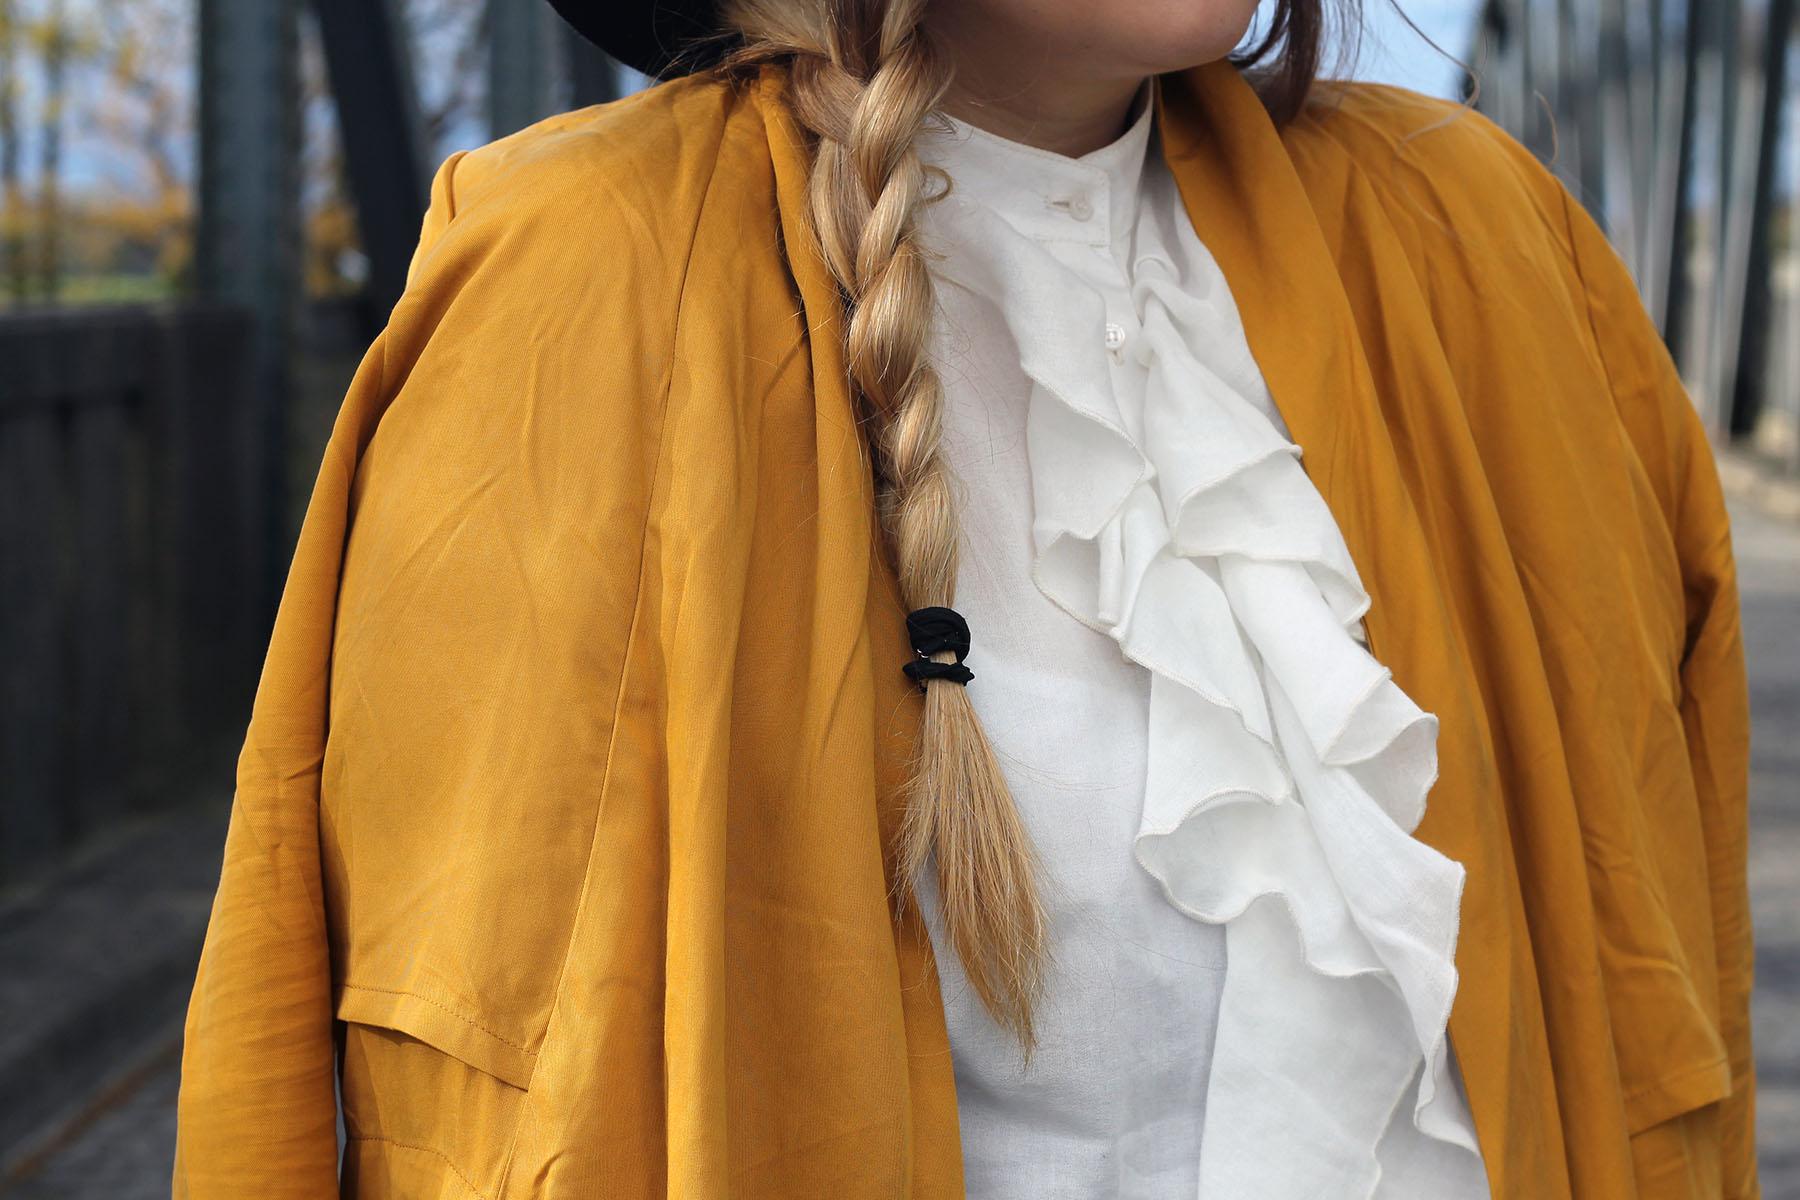 outfit-modeblog-bluse-rüschen-trend-gelber-mantel